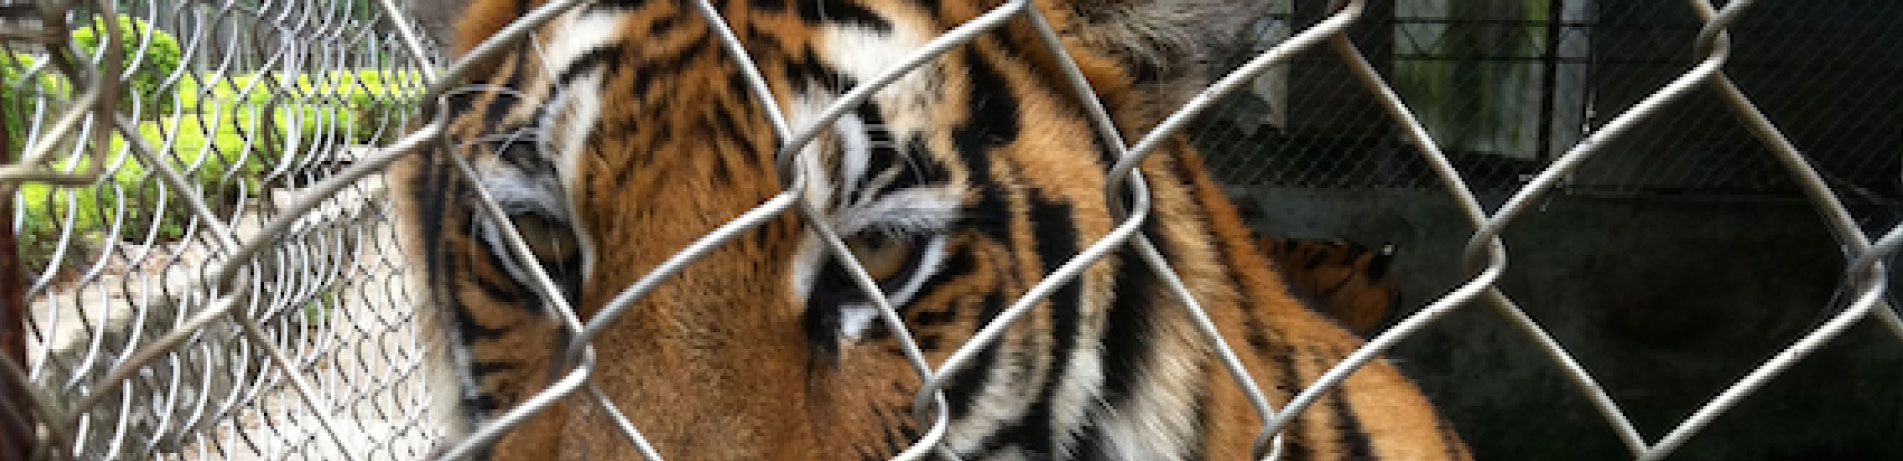 Captive tiger behind fence, China